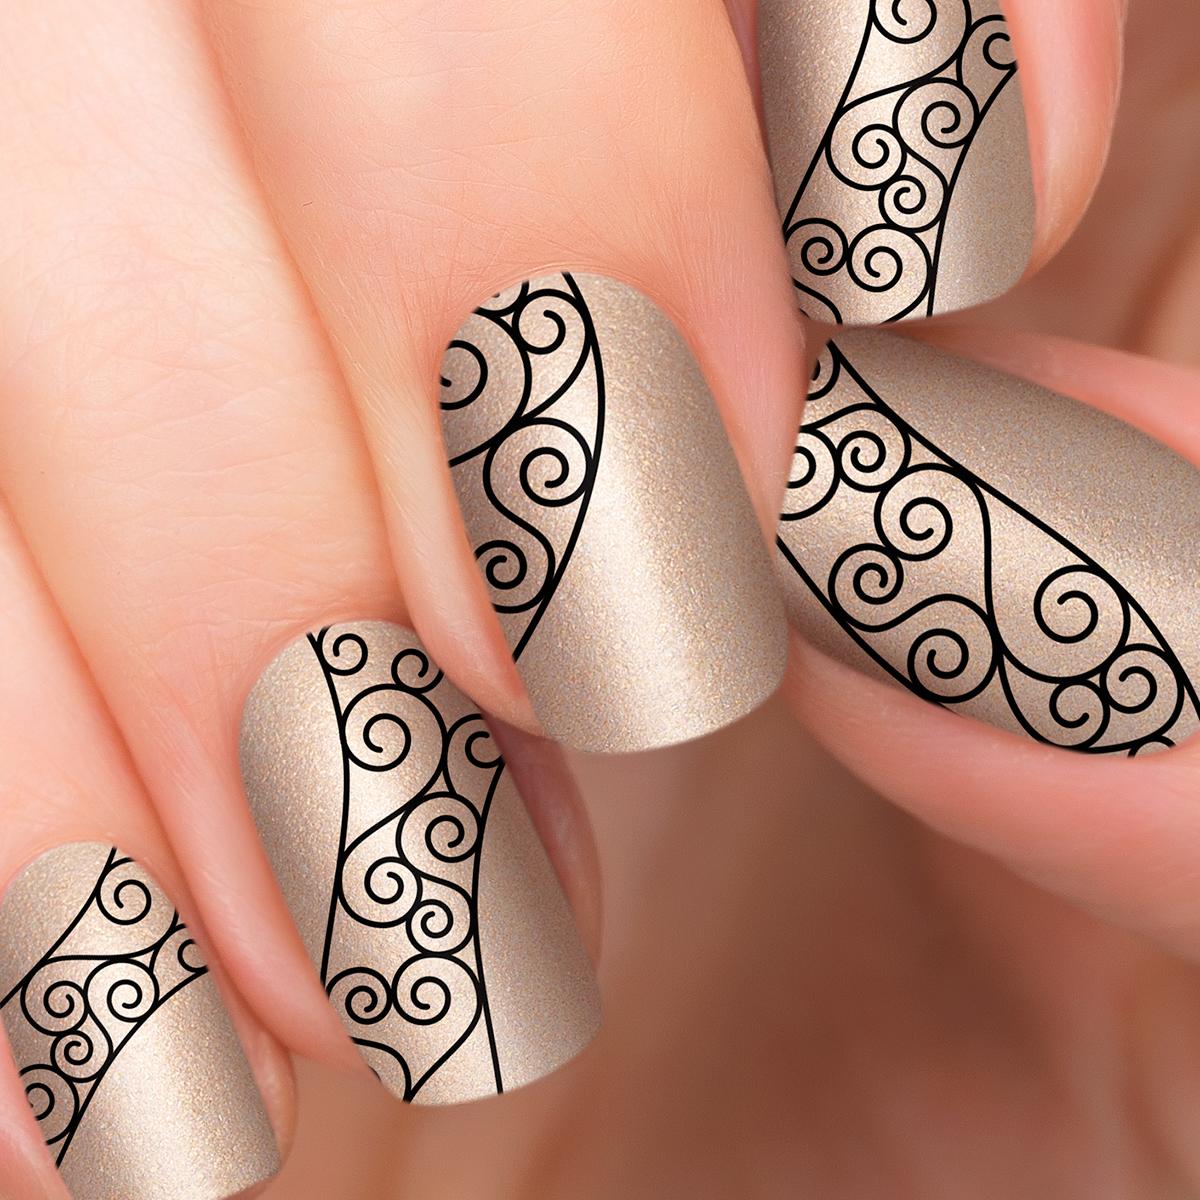 Incoco.com Incoco Nail Polish Strips, Magic Spell